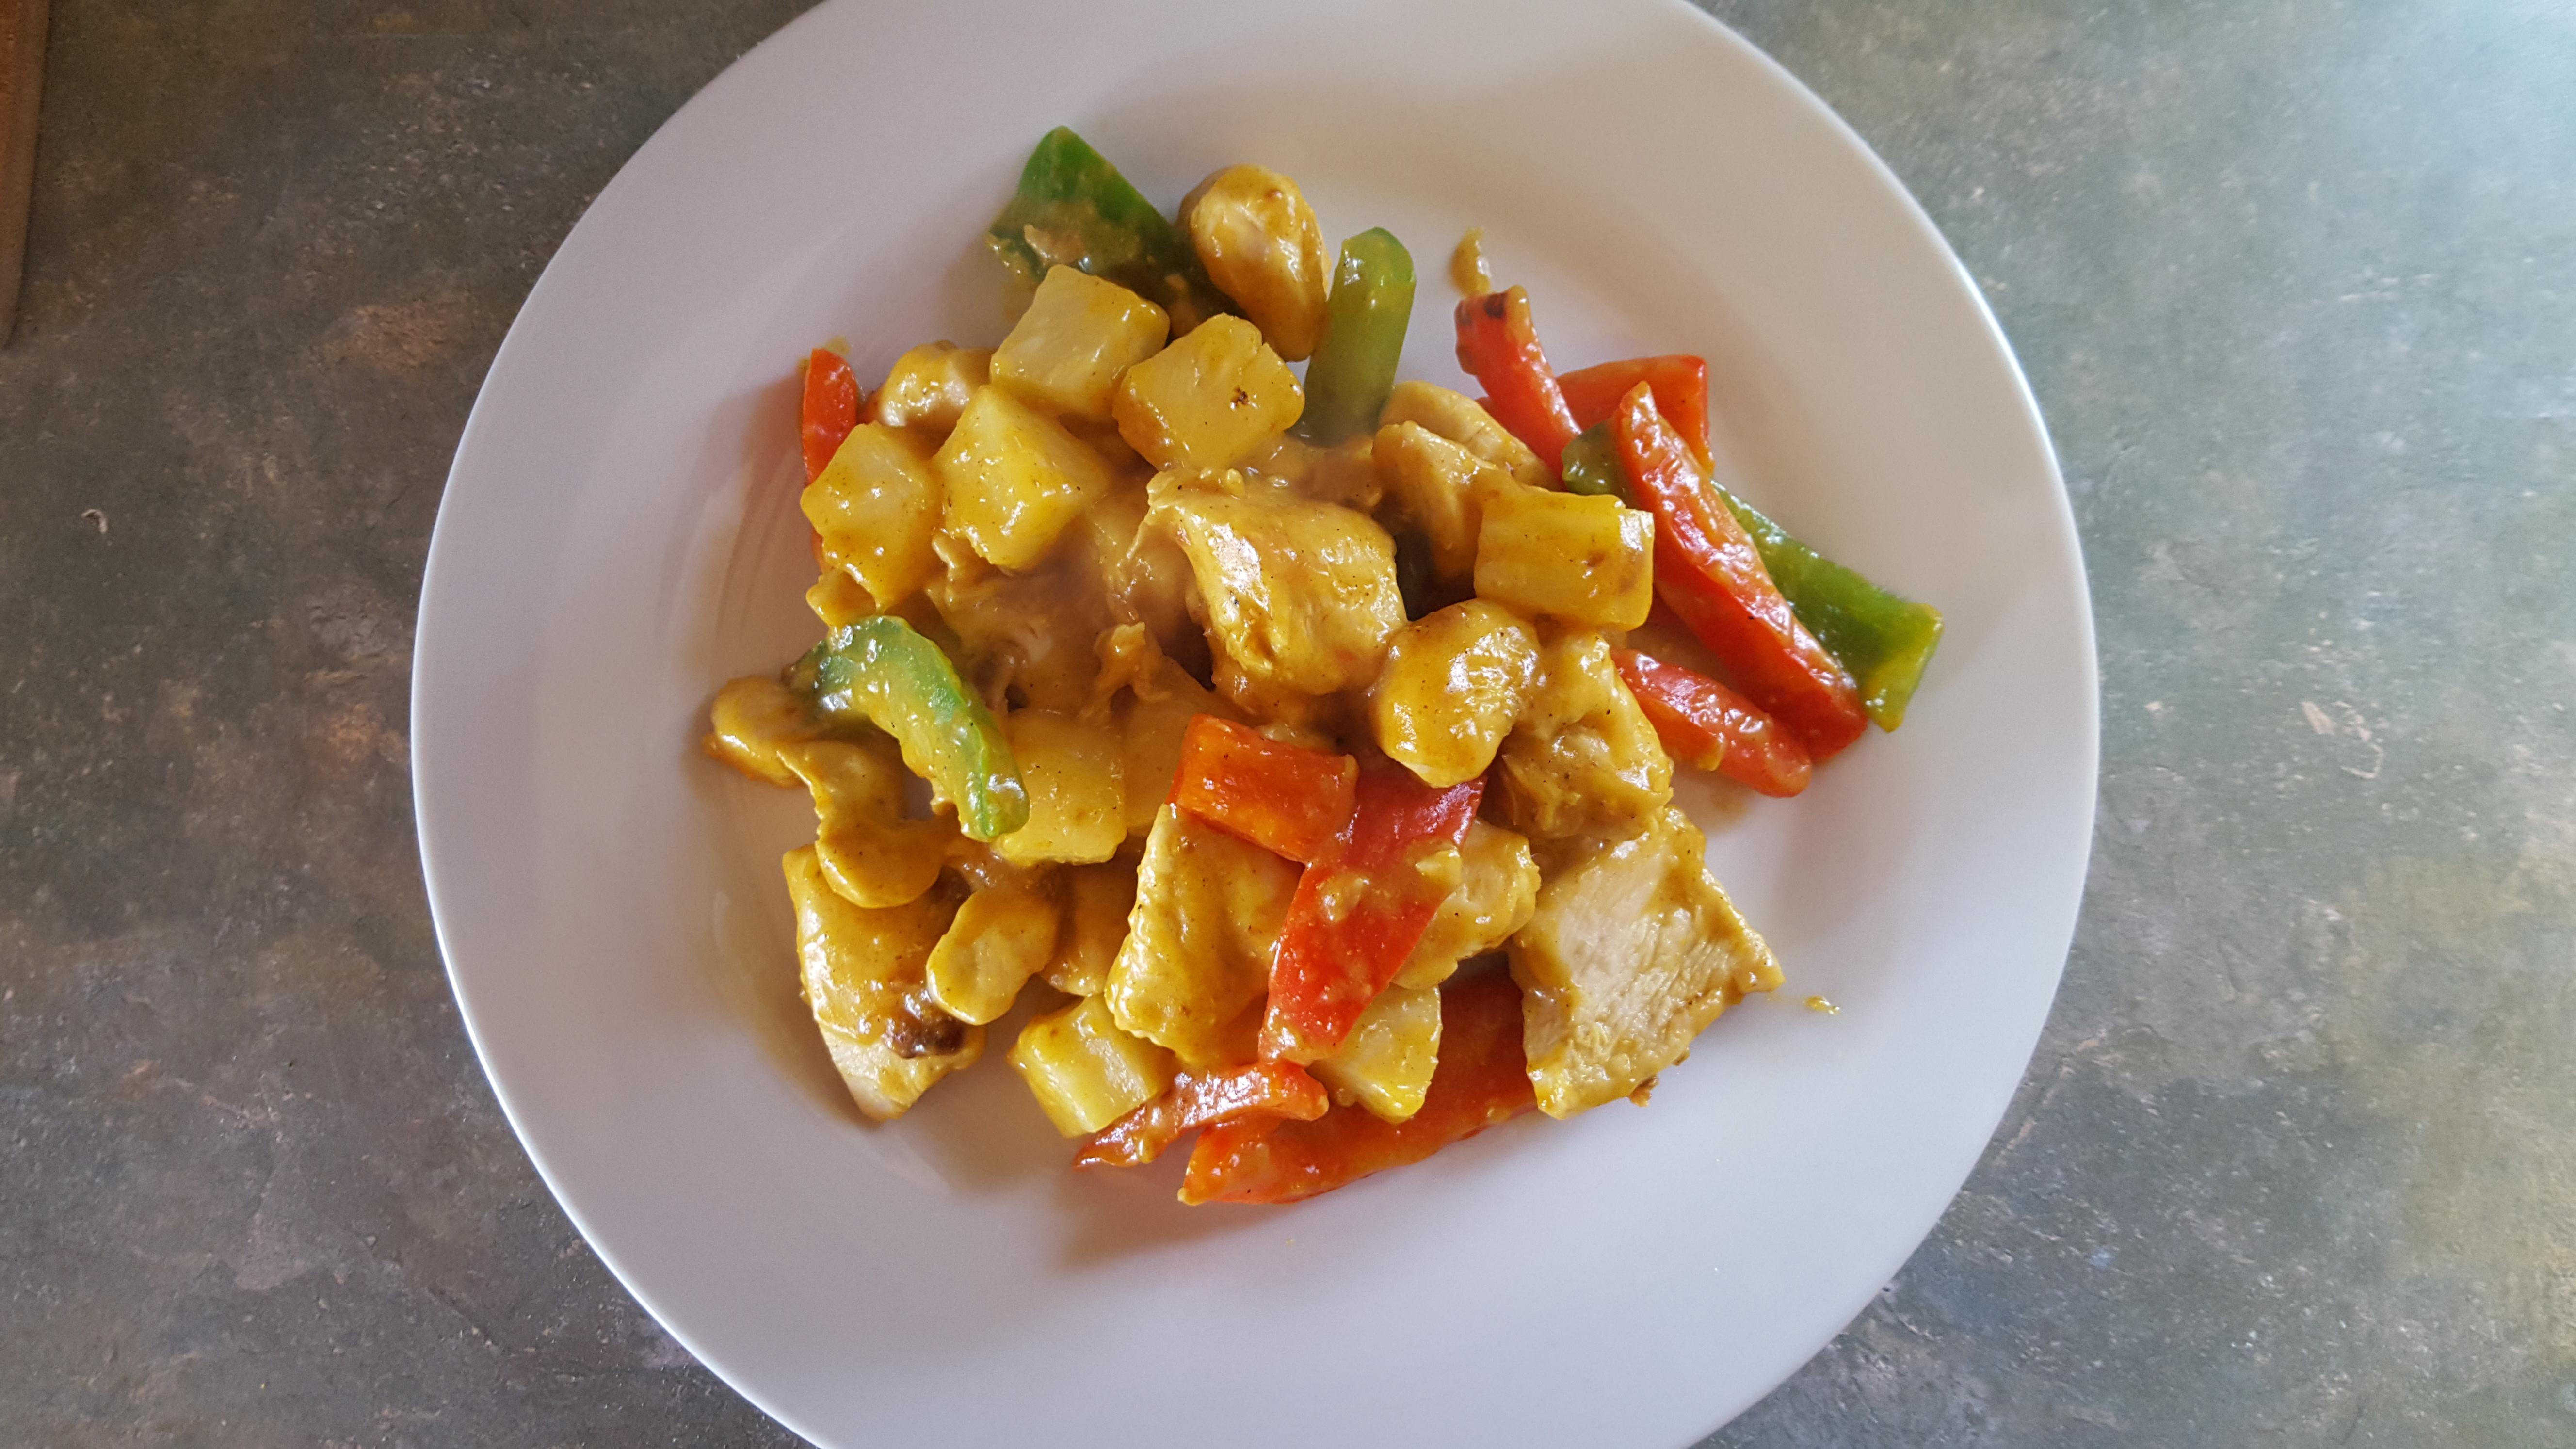 Pineapple chicken 2